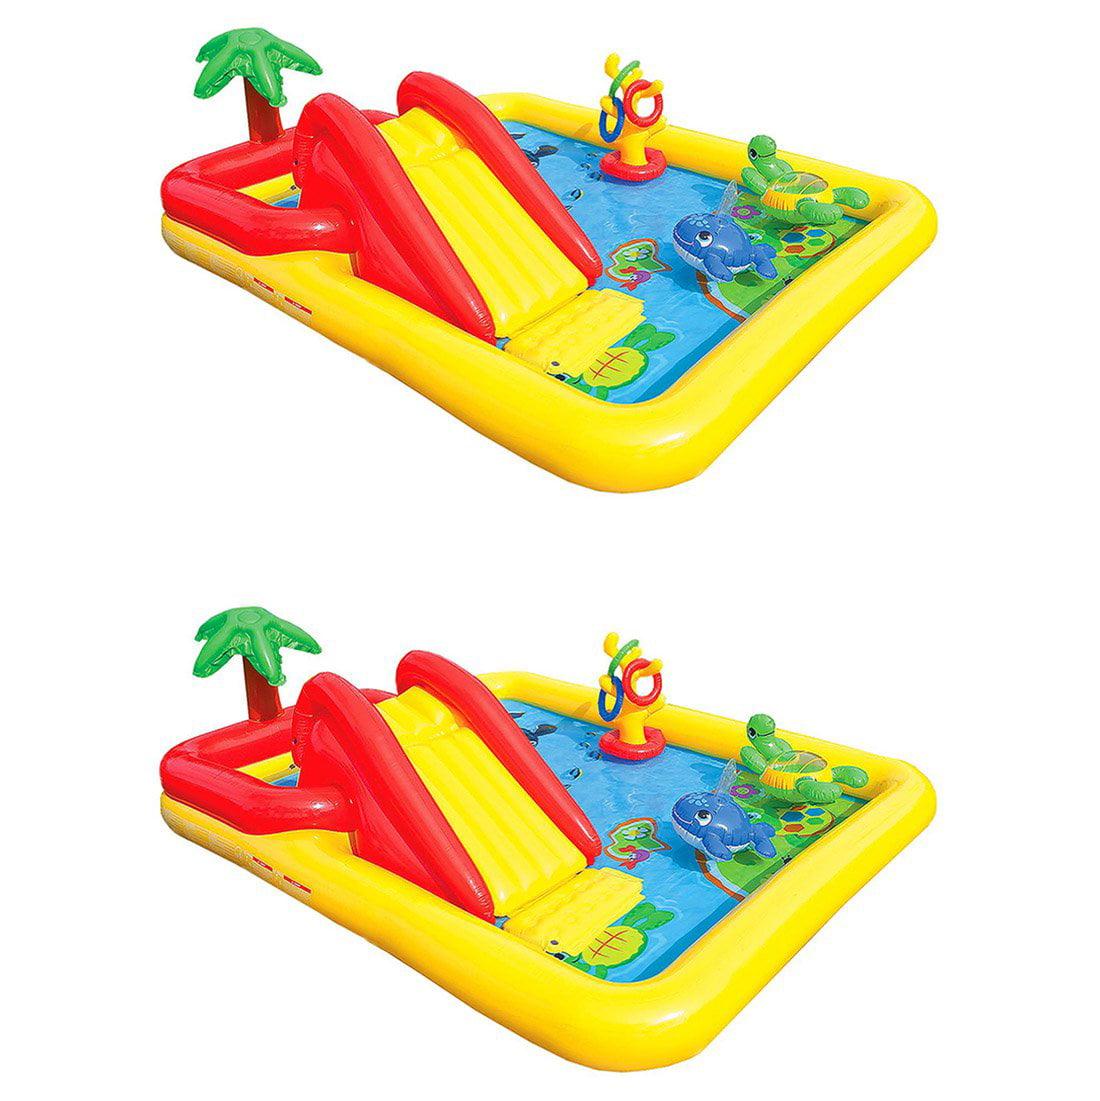 Intex Inflatable Ocean Play Center Kids Backyard Swimming Pool + Games (2 Pack)